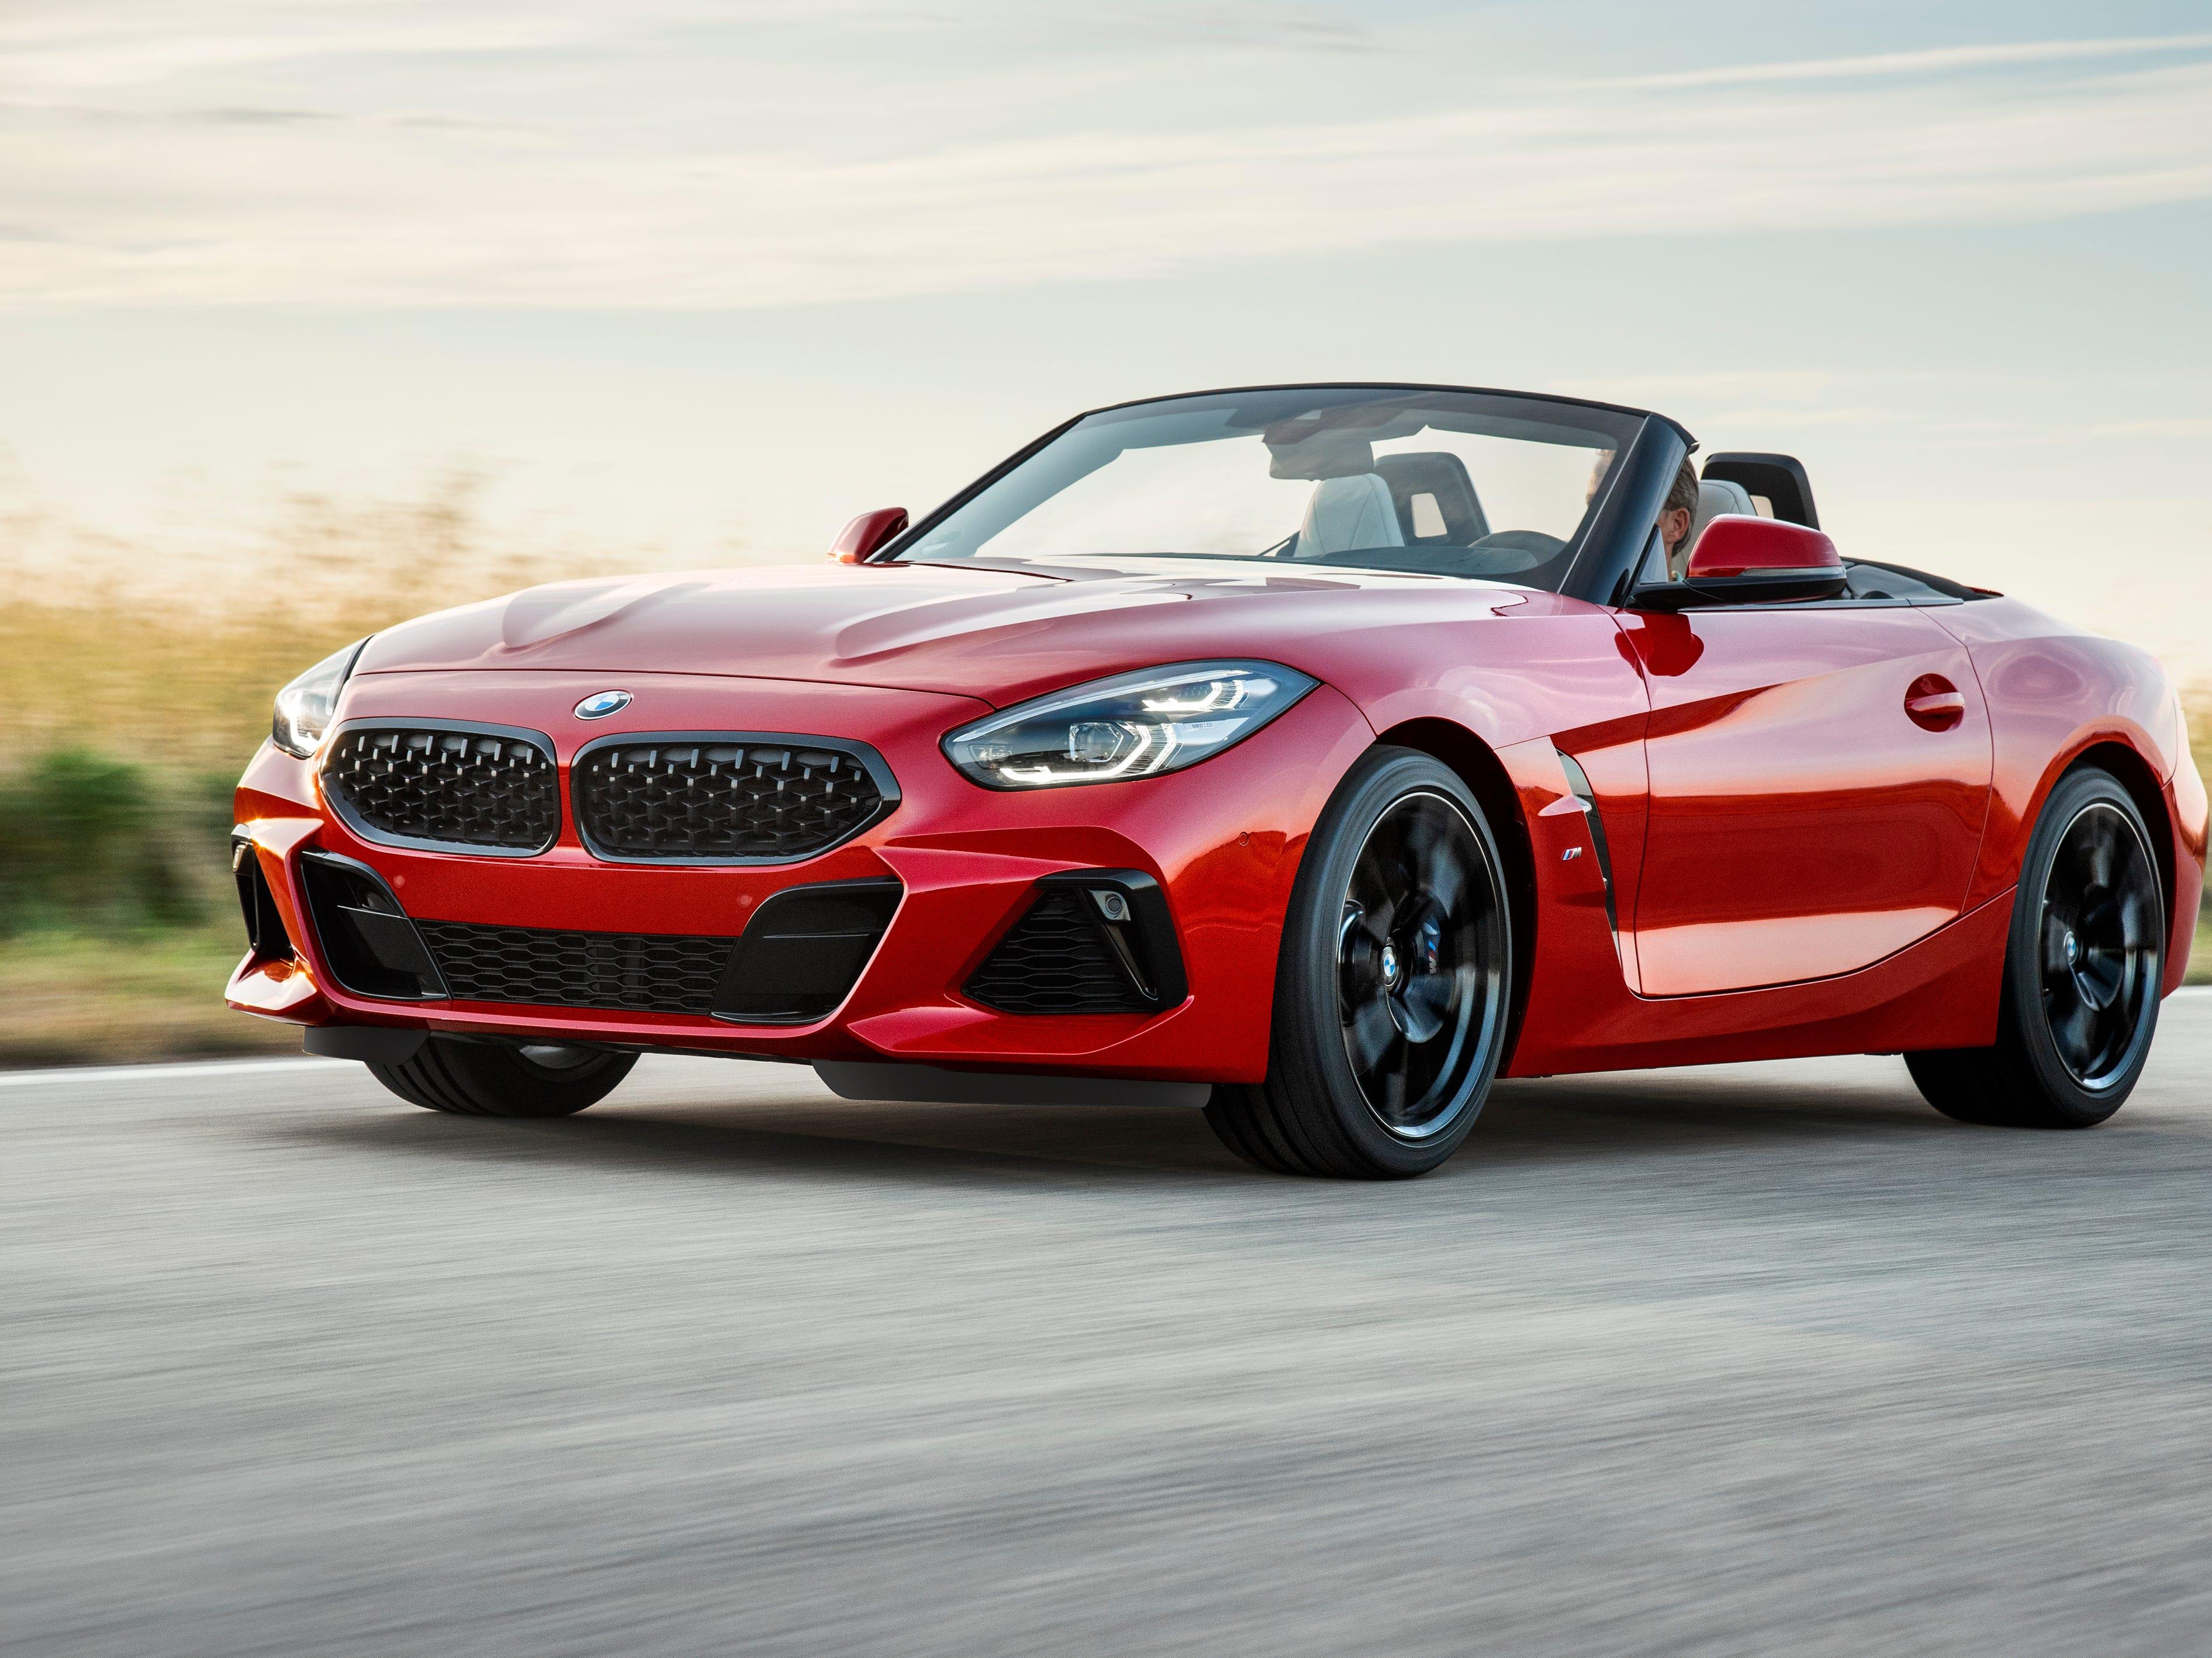 The 2019 BMW Z4 Roadster.